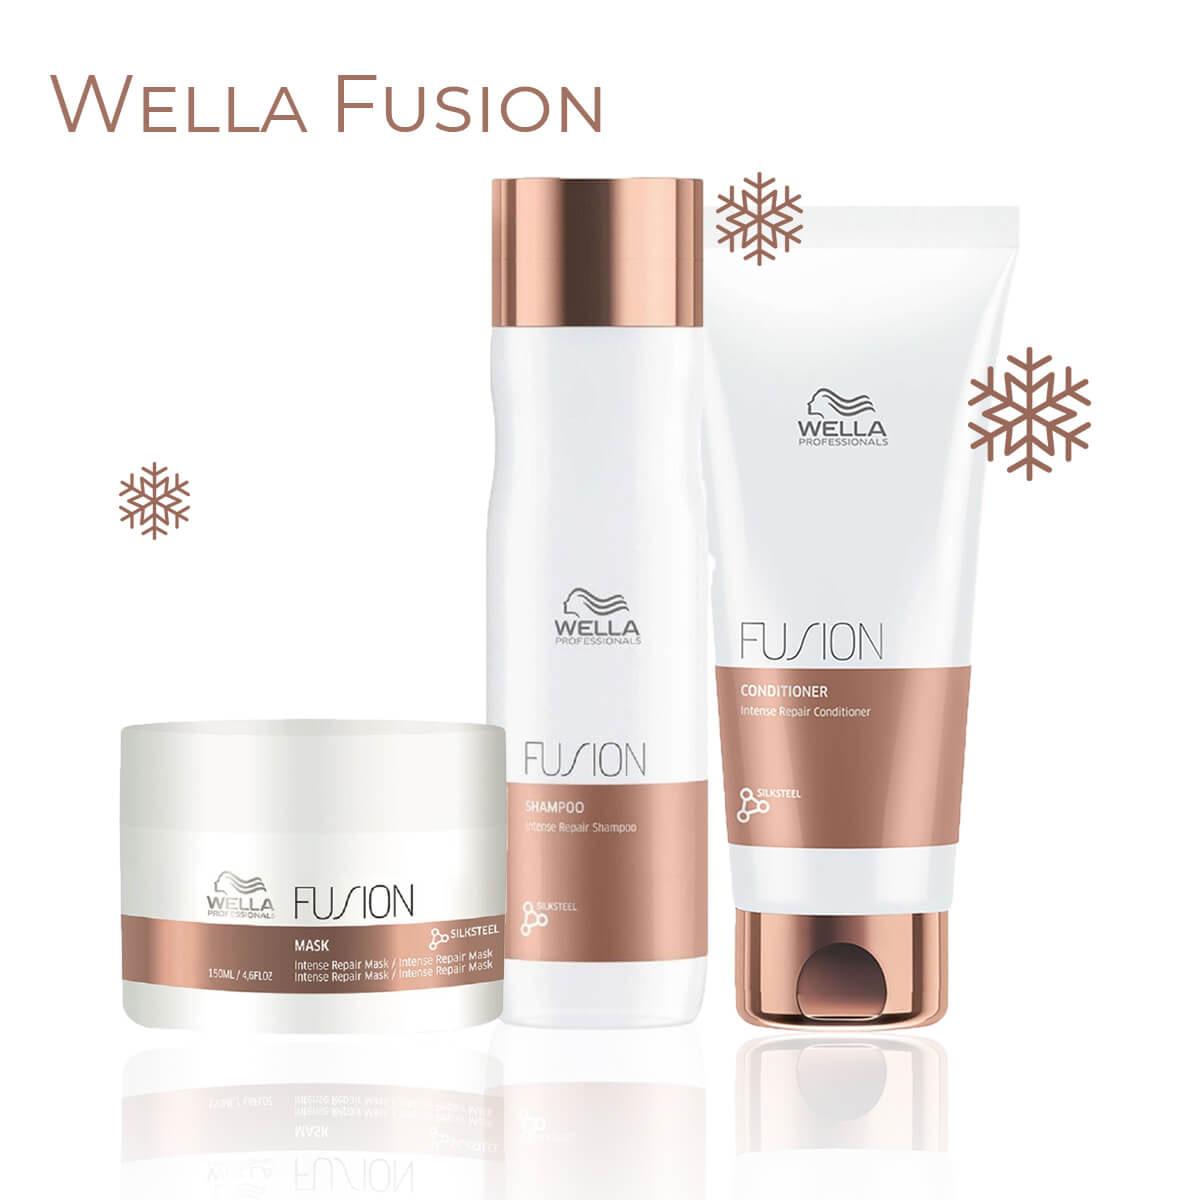 Wella Fusion Gift Set